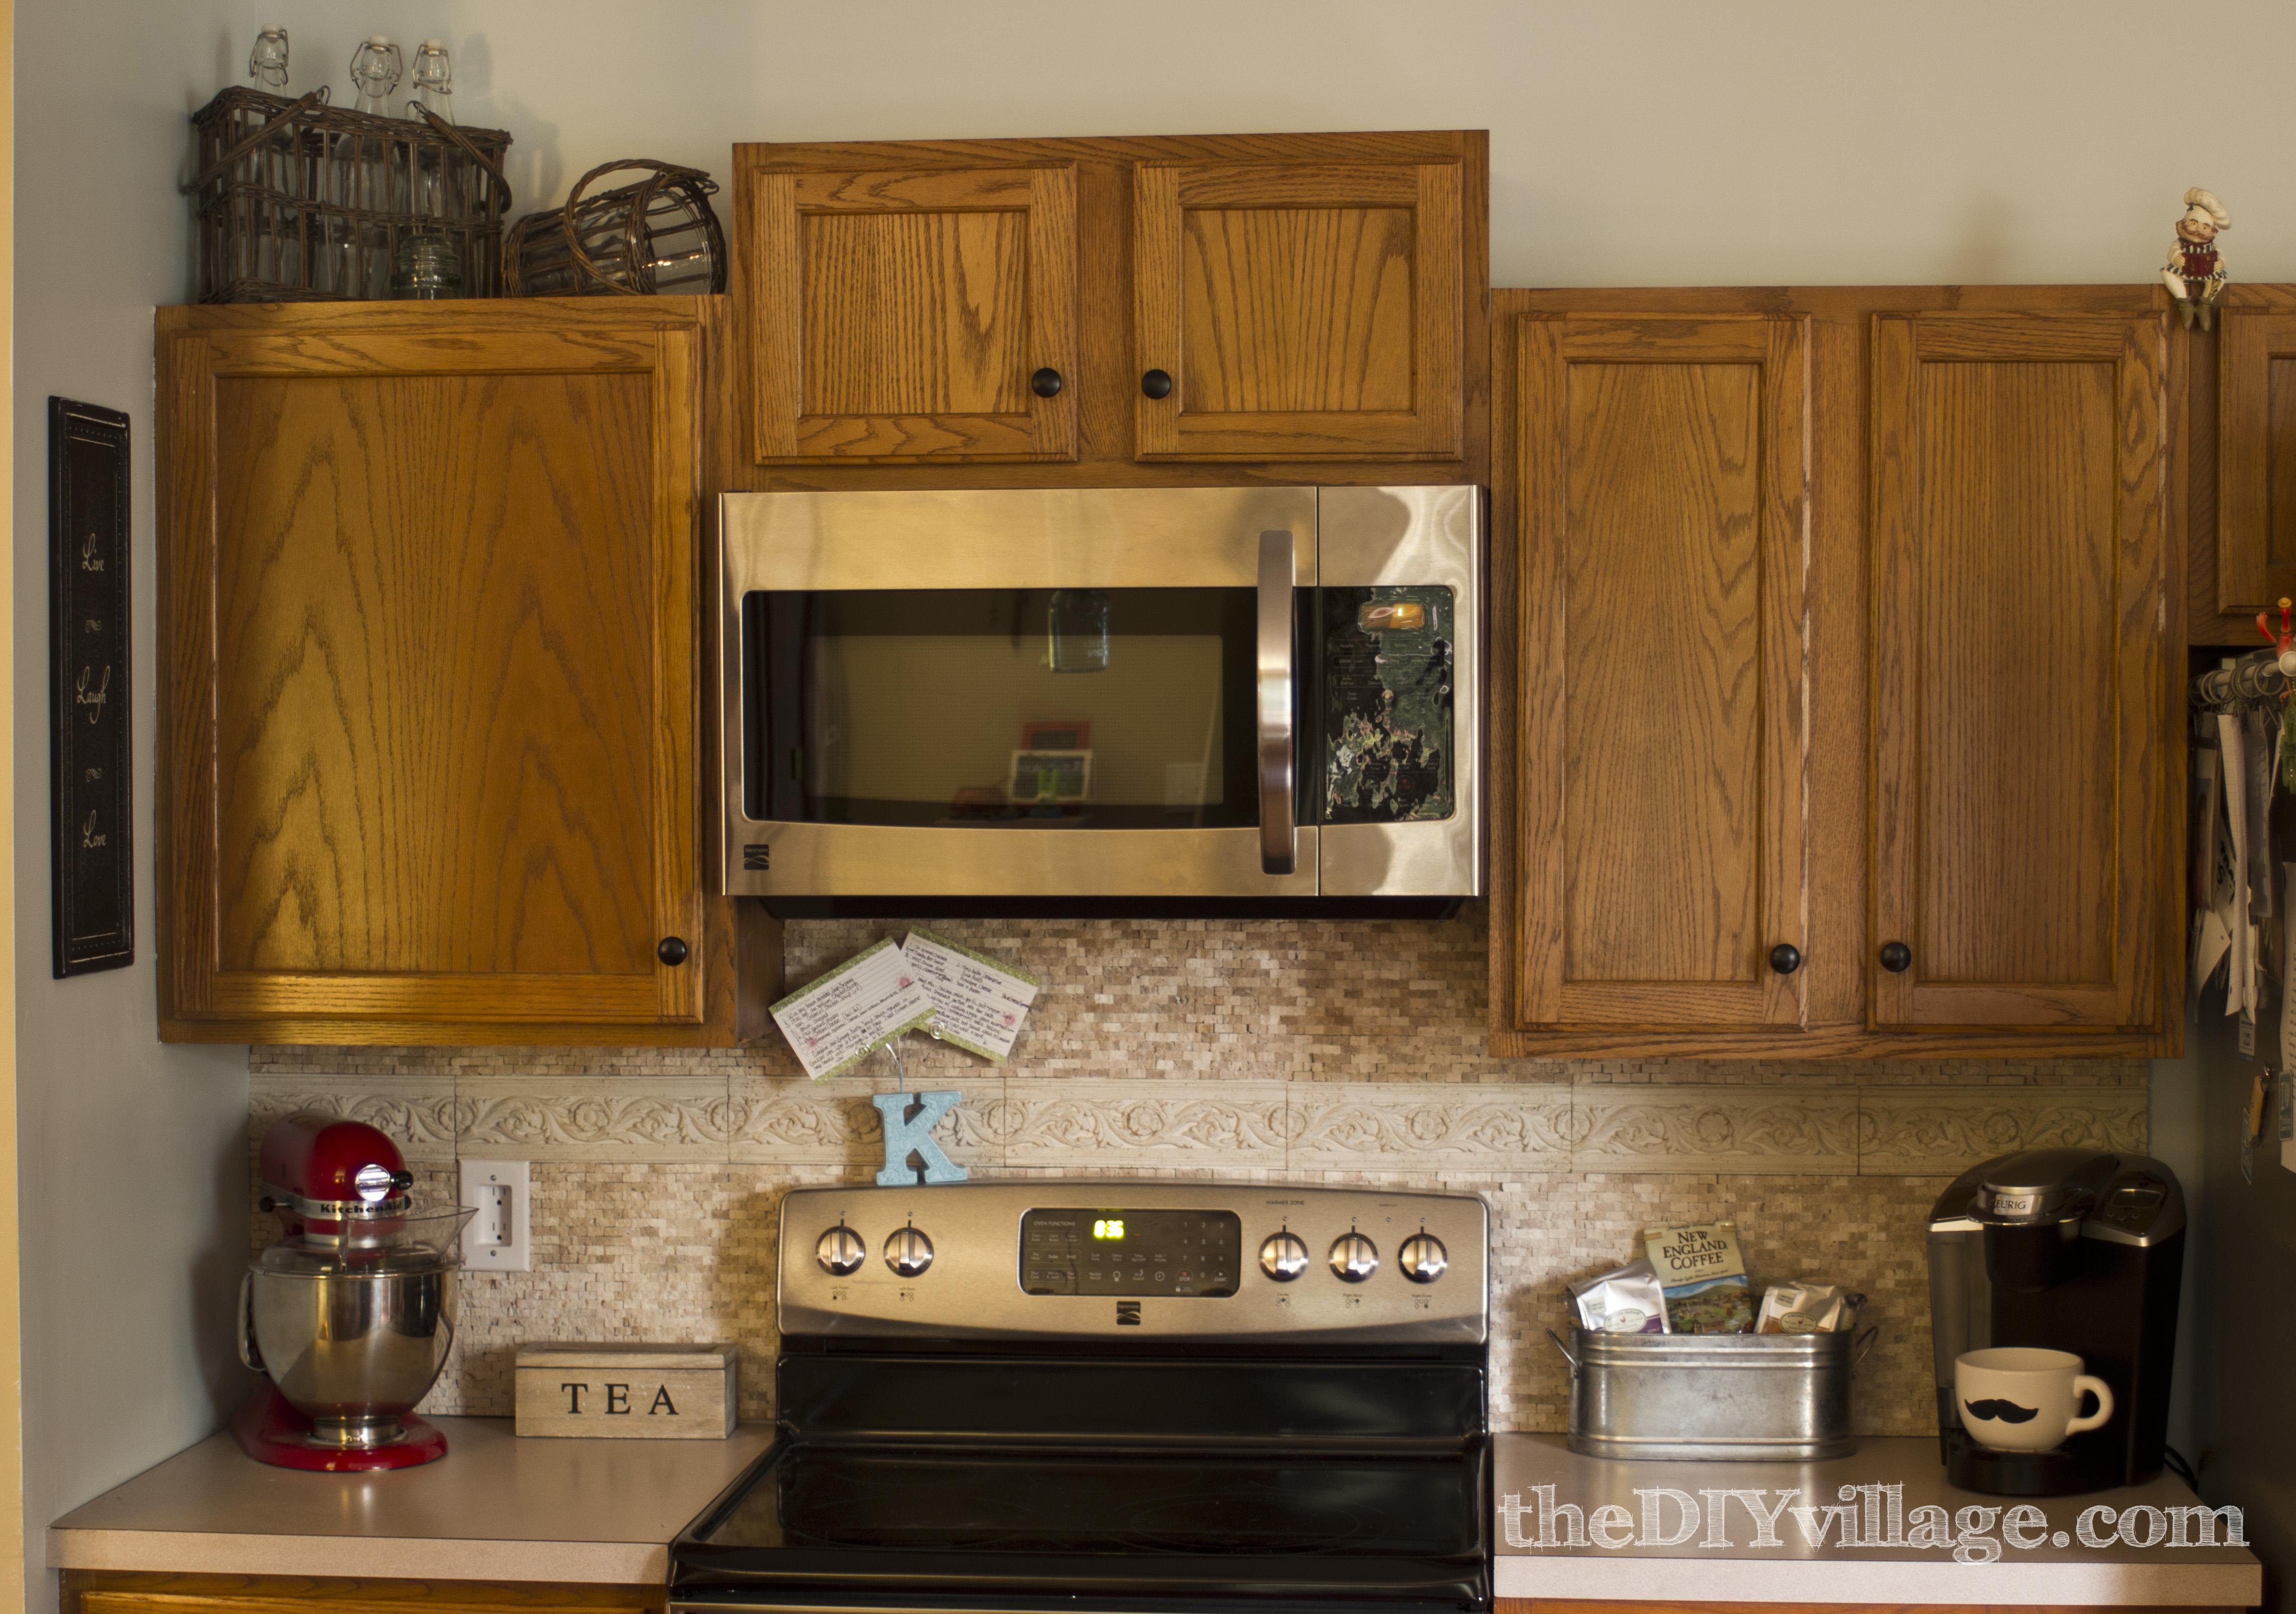 Kitchen Tile Designs Behind Stove